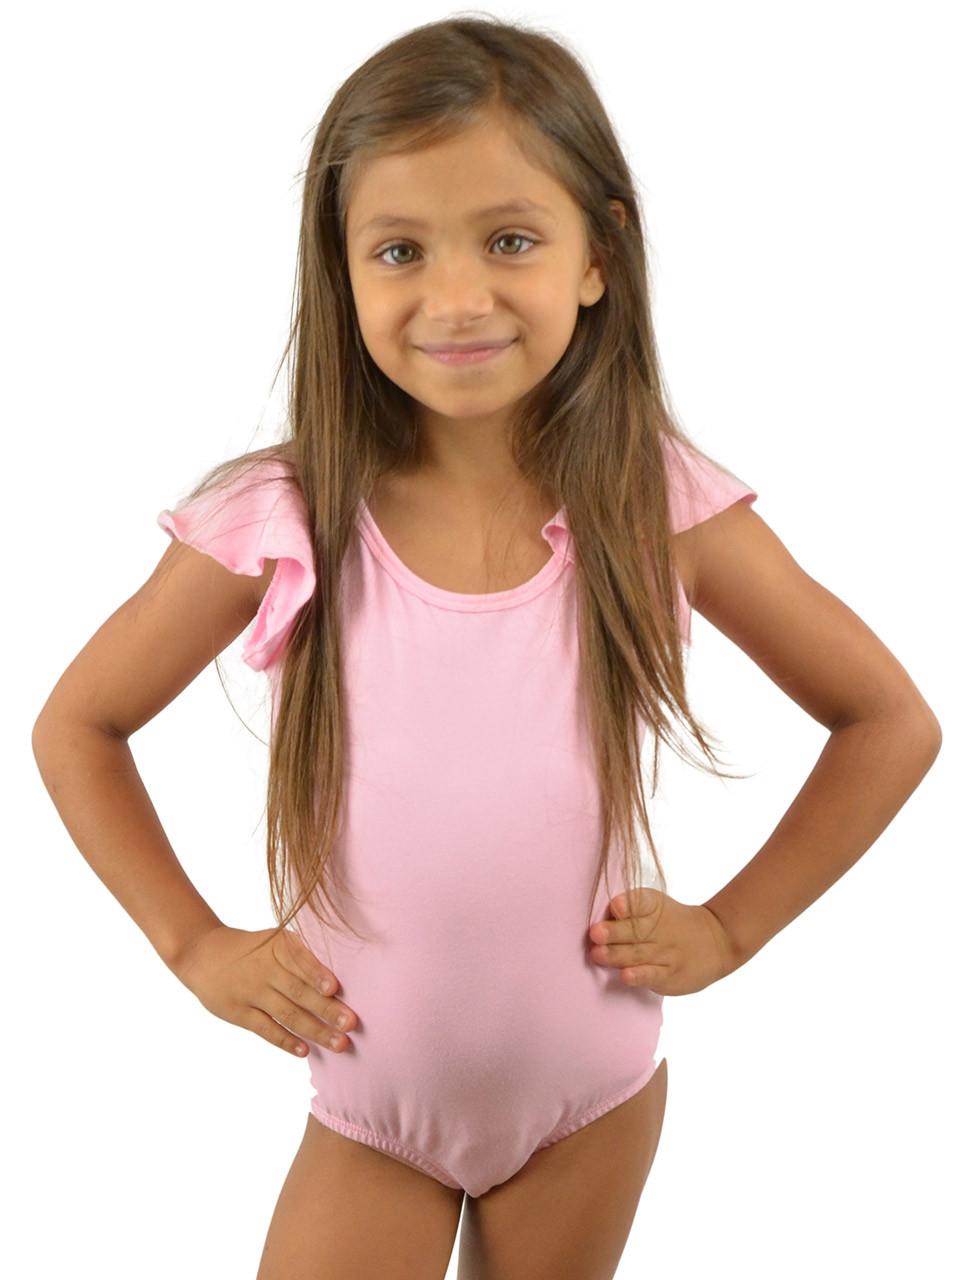 69bb300e0 Vivian s Fashions Dancewear - Girls Ruffle Peplum Sleeves leotard ...